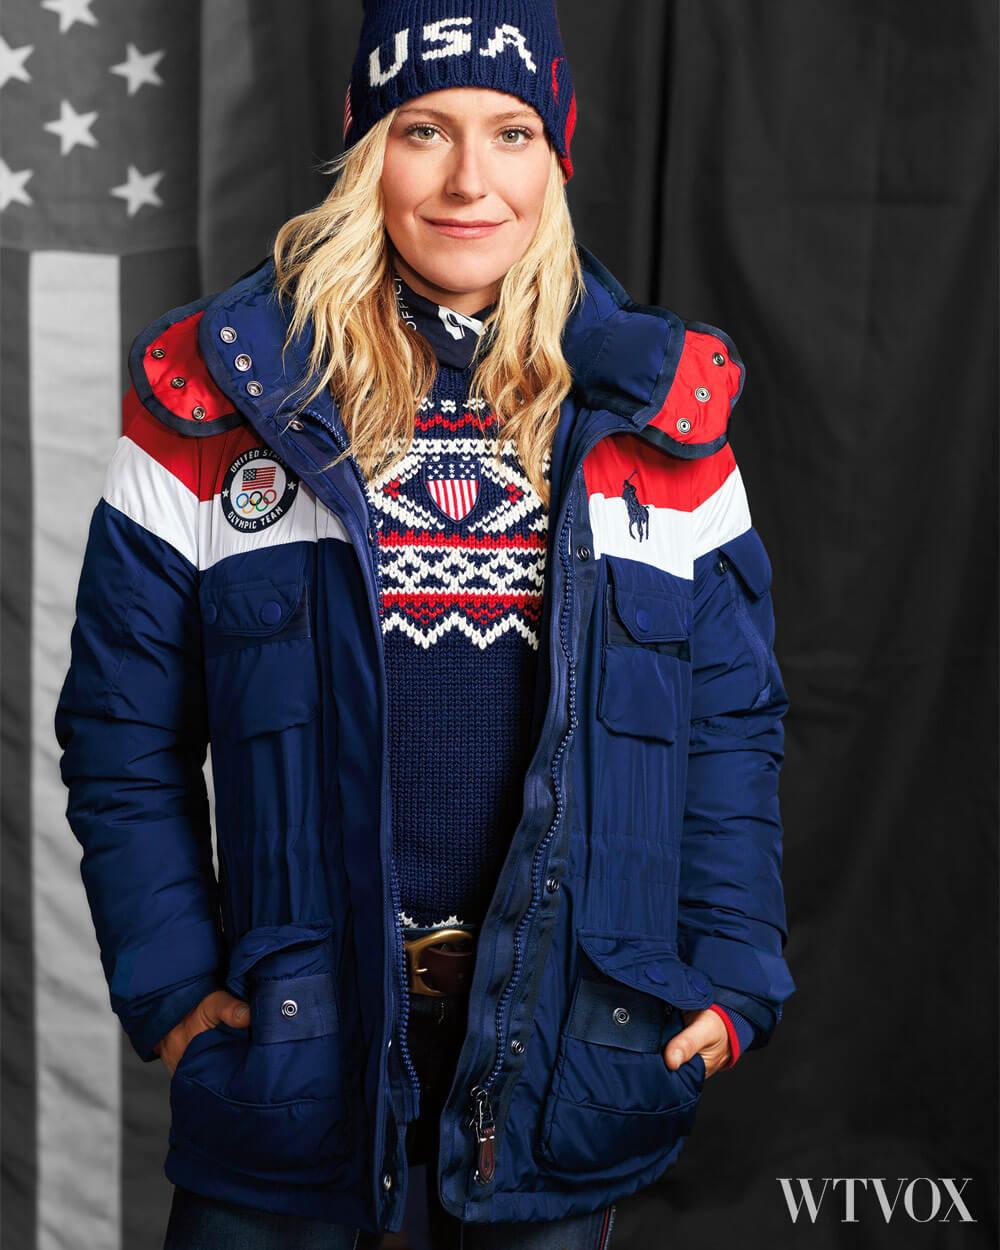 The 2018 winter Olympics Us team wearing Polo Ralph heated jacket